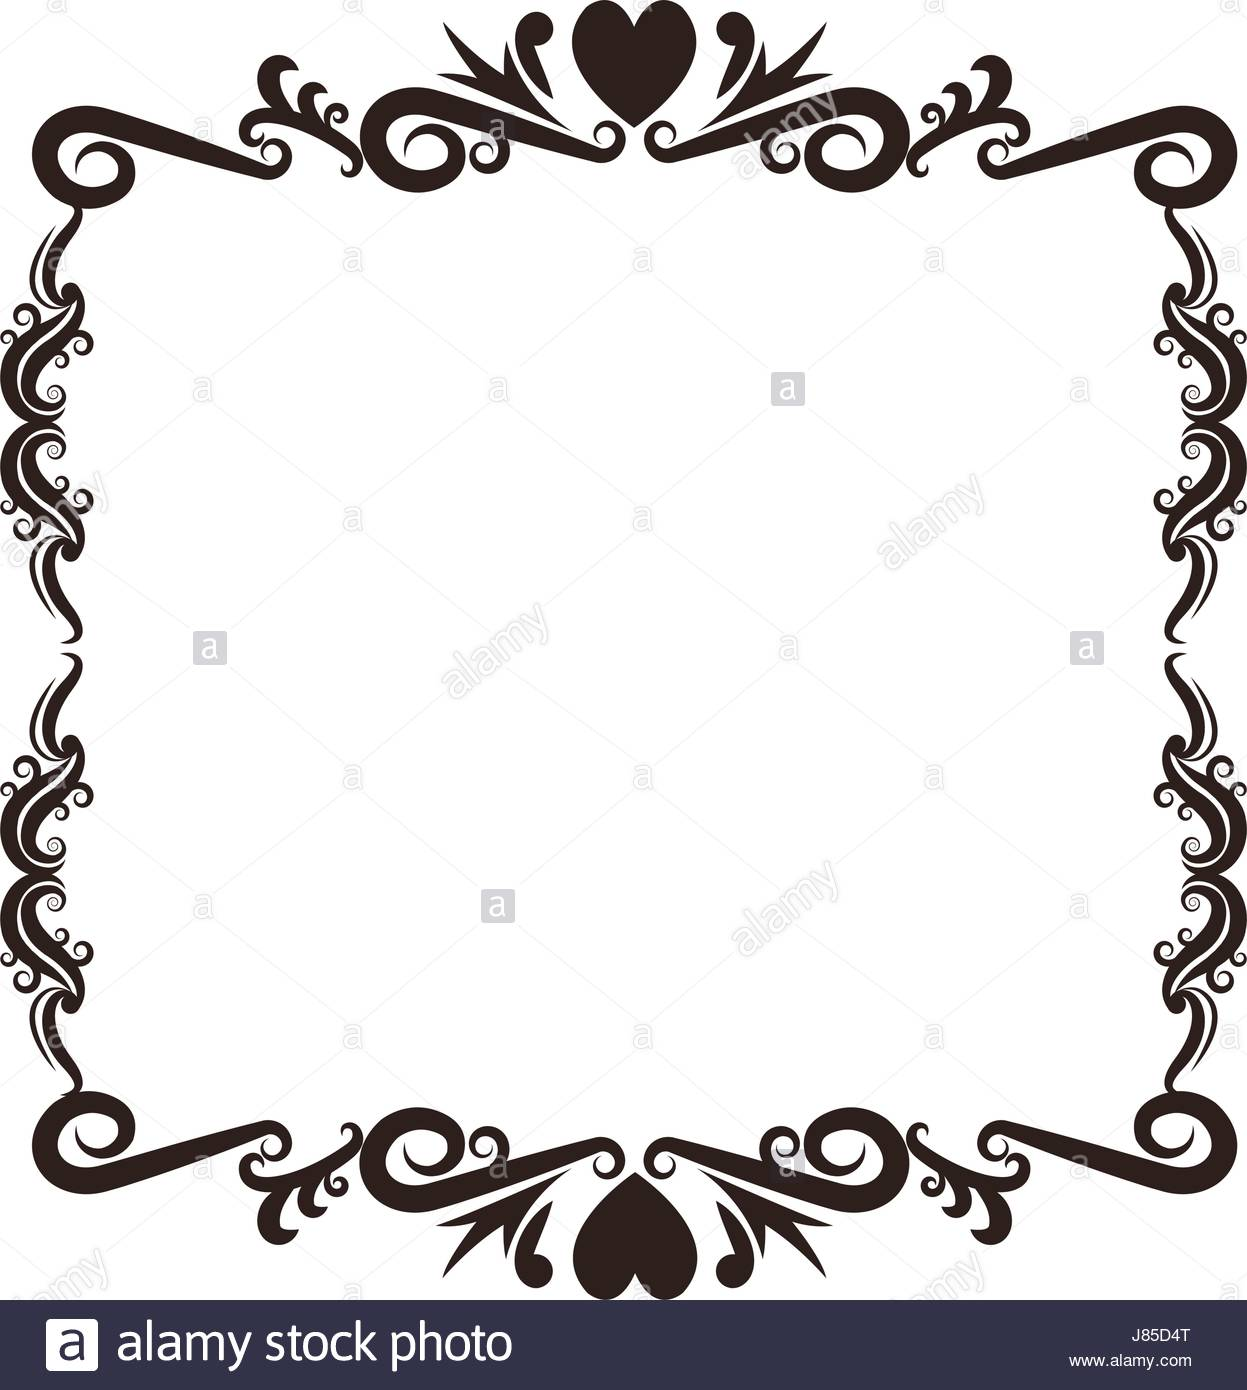 1247x1390 Vintage Baroque Frame Scroll Floral Ornament Border Retro Pattern